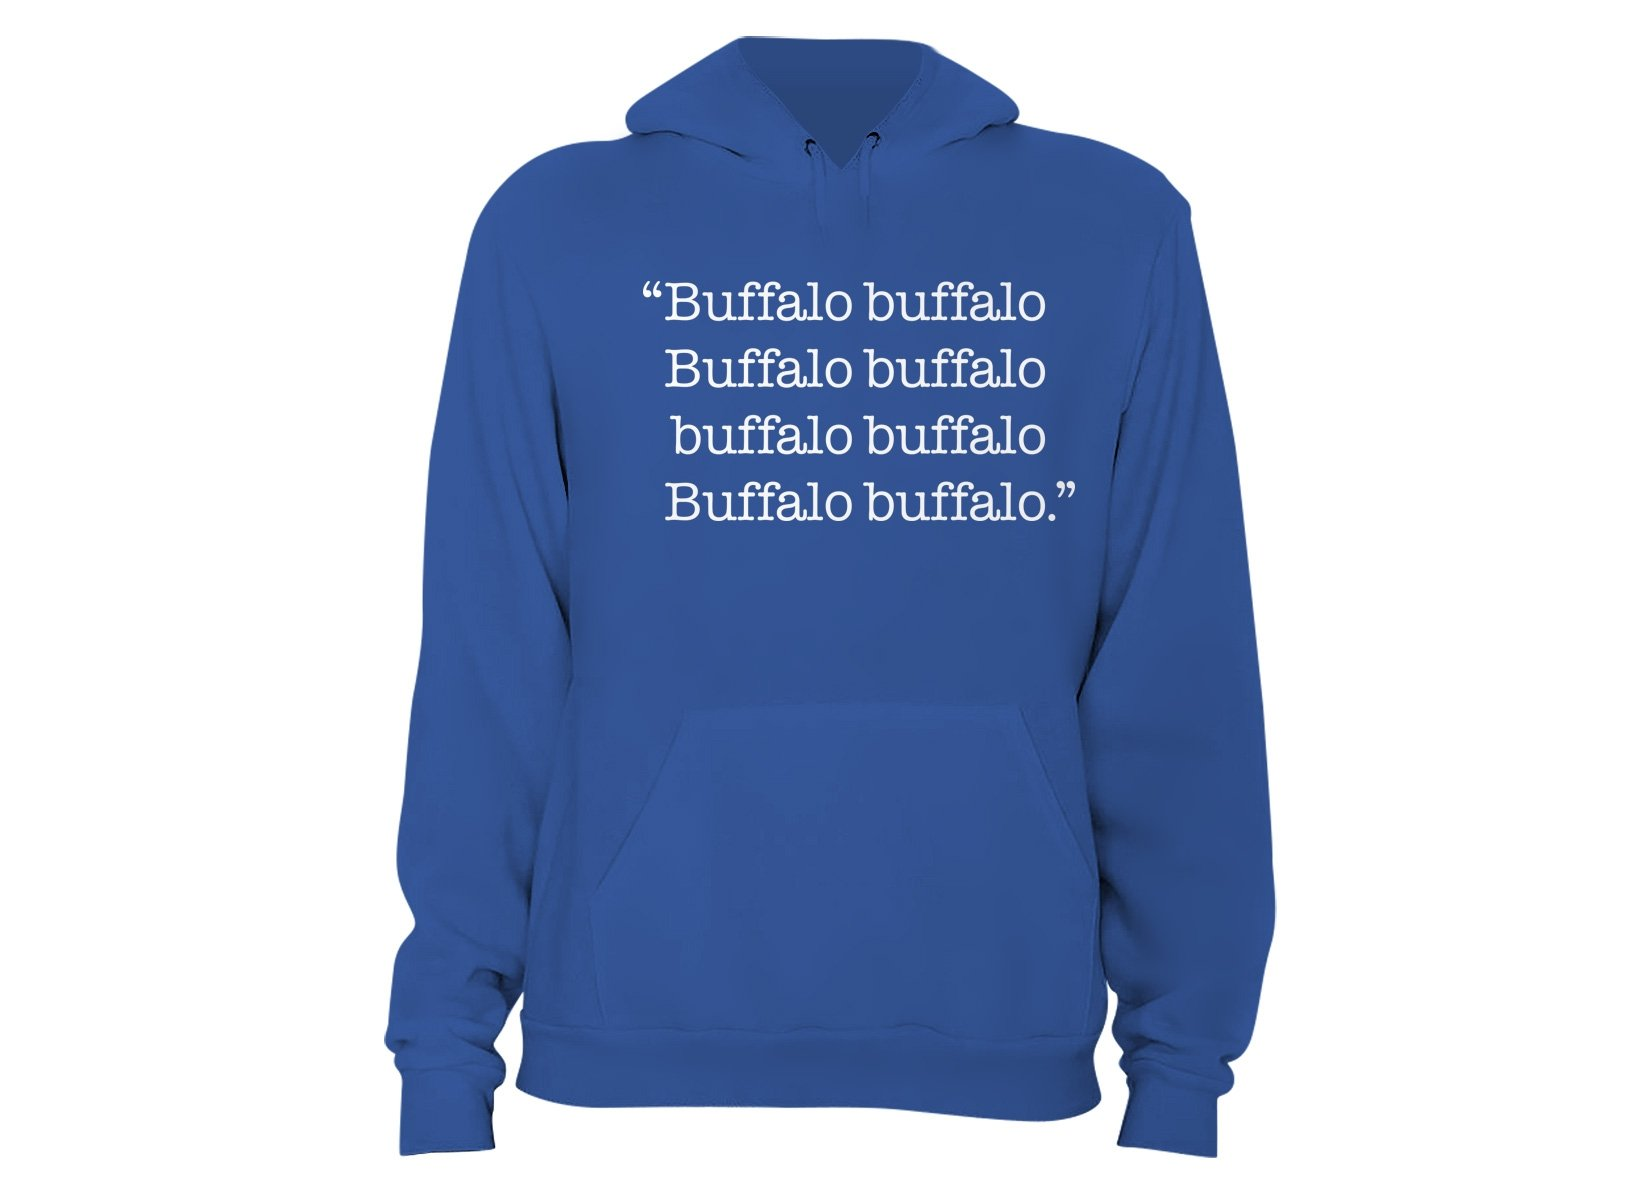 Buffalo buffalo on Hoodie